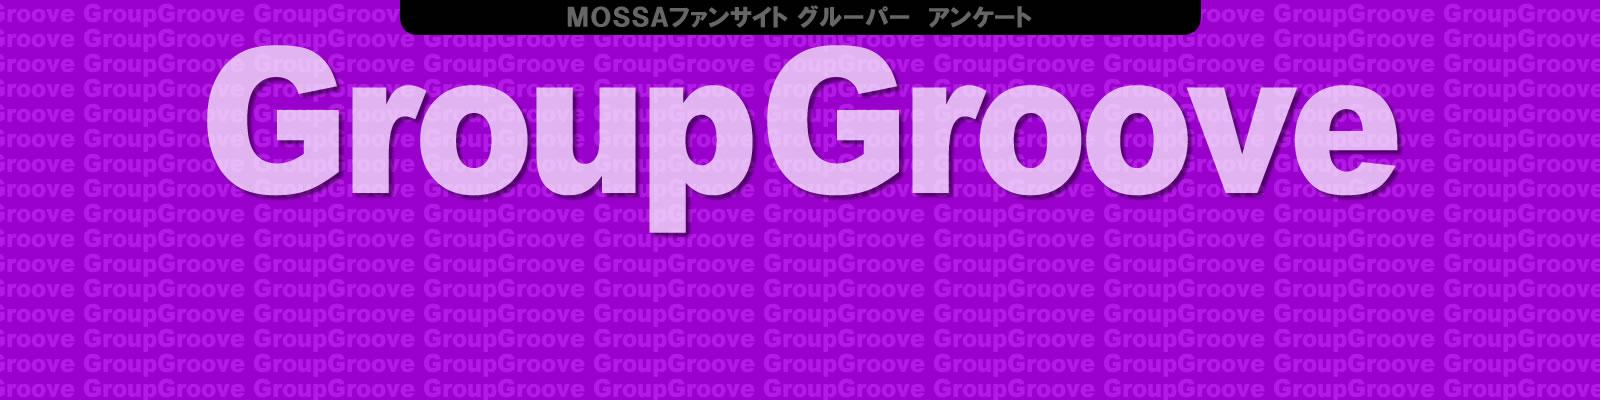 GroupGrooveやってる方にアンケート!